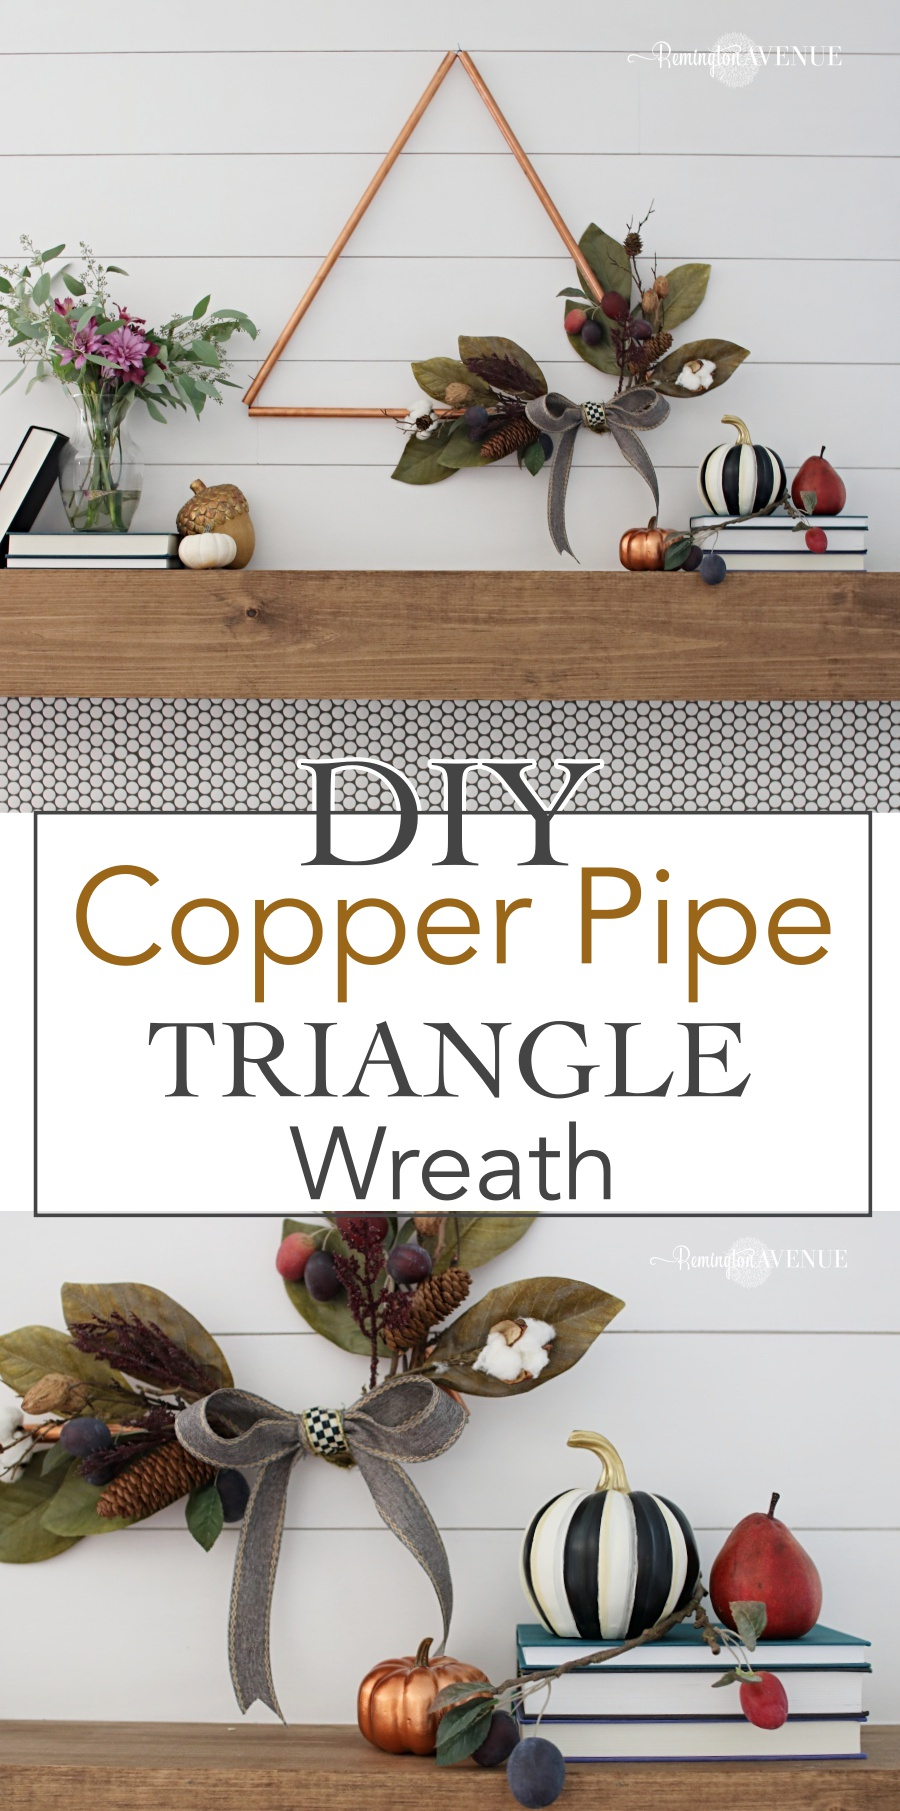 DIY copper triangle wreath tutorial